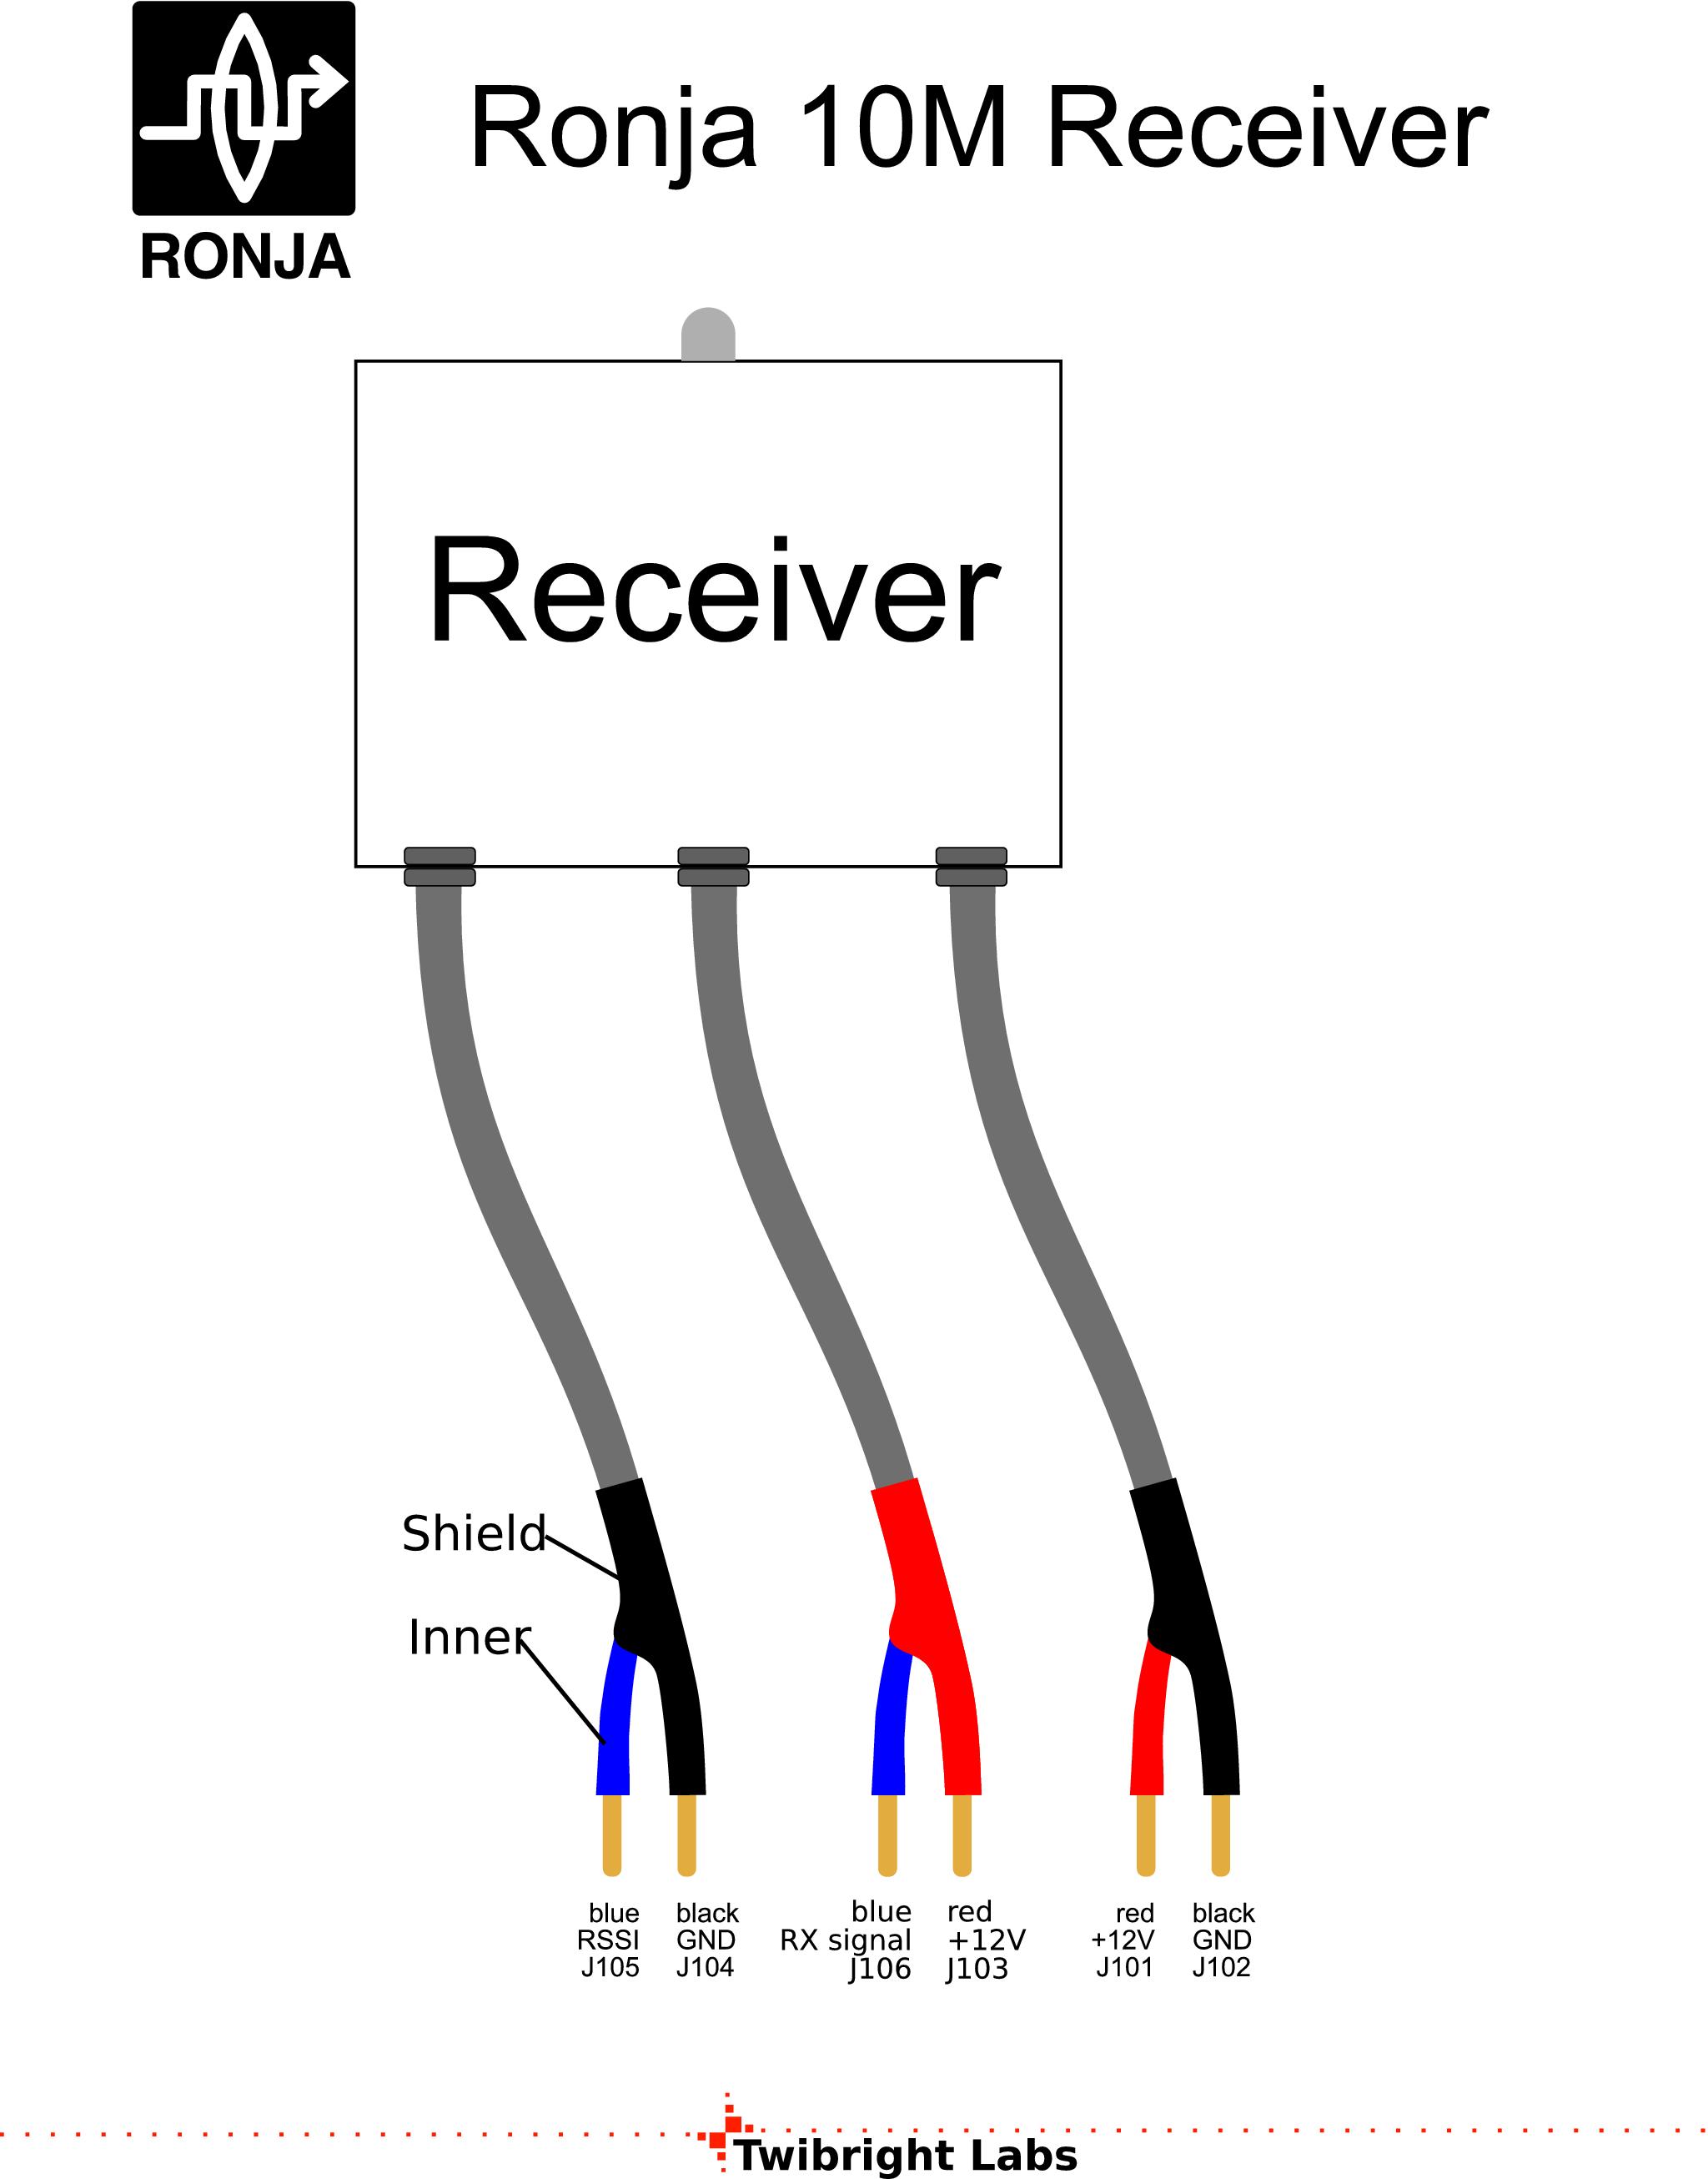 building ronja 10m receiver